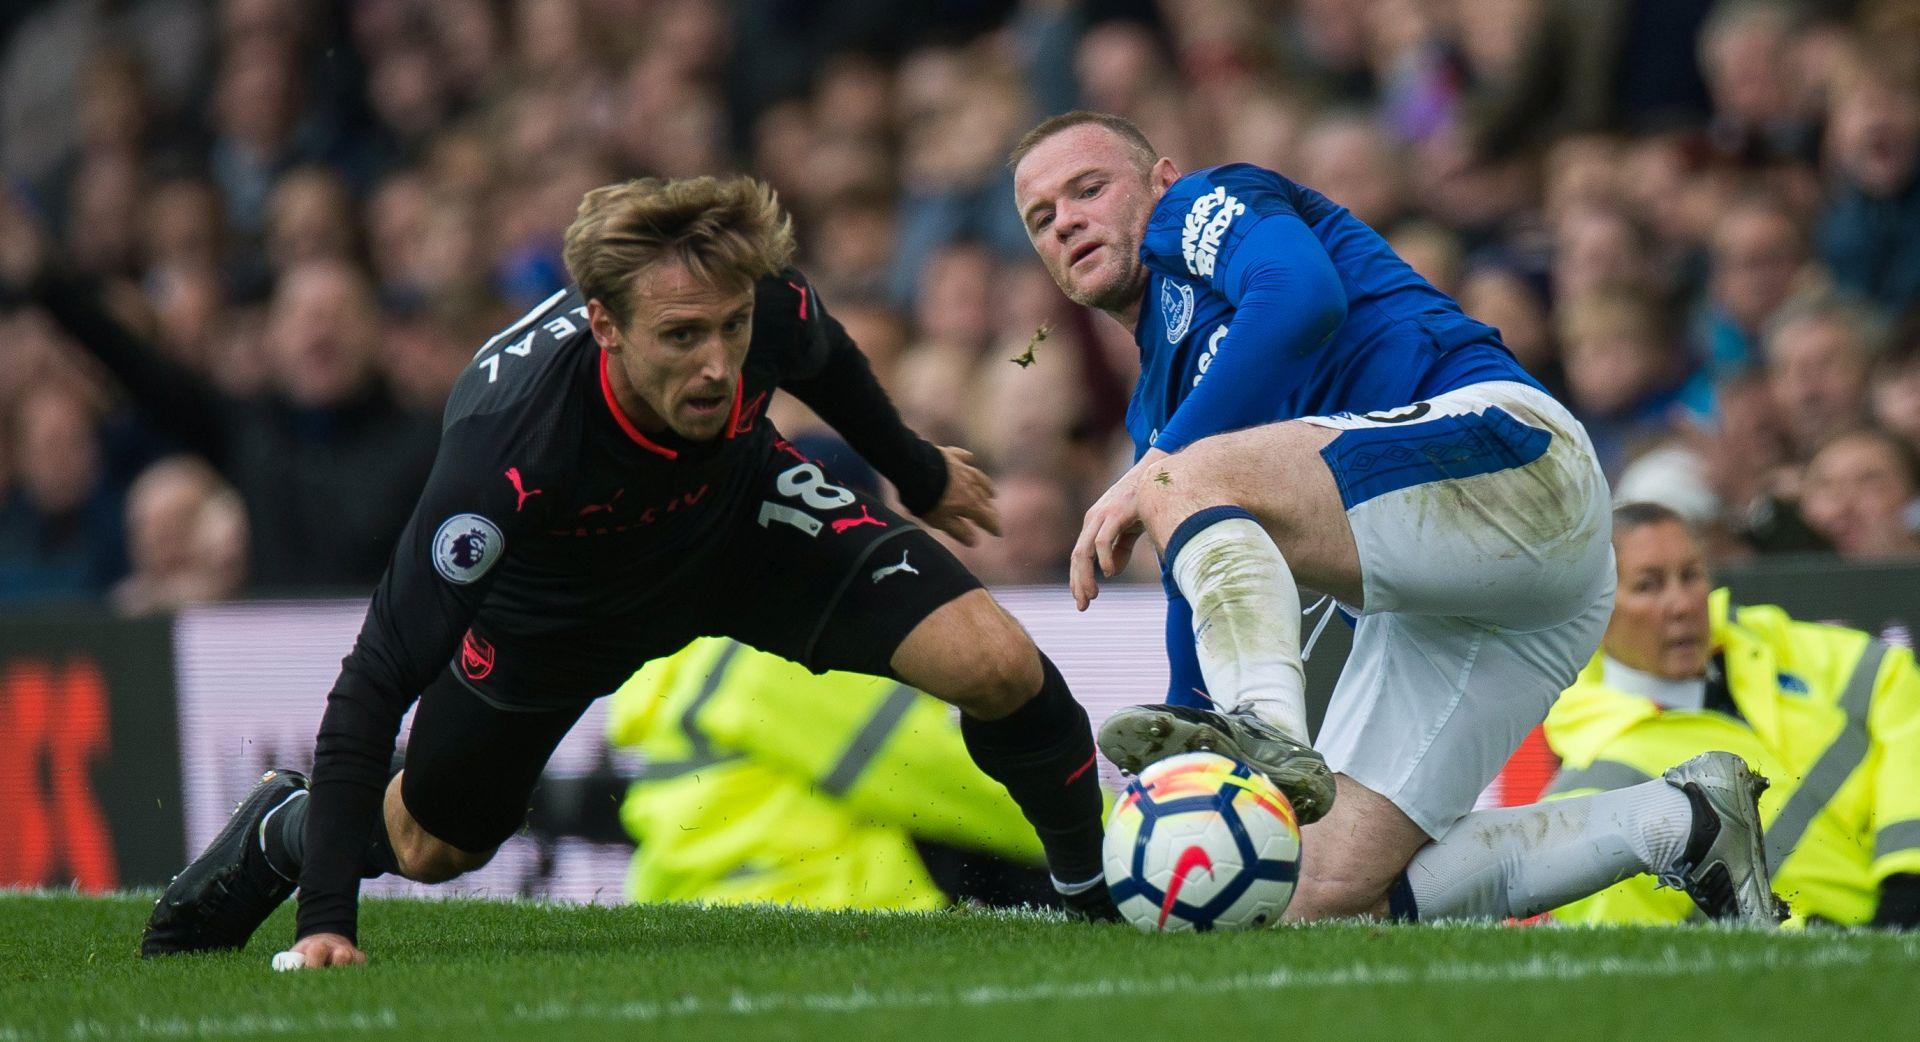 PREMIERLIGA Arsenal 'gurnuo' Everton prema zoni ispadanja